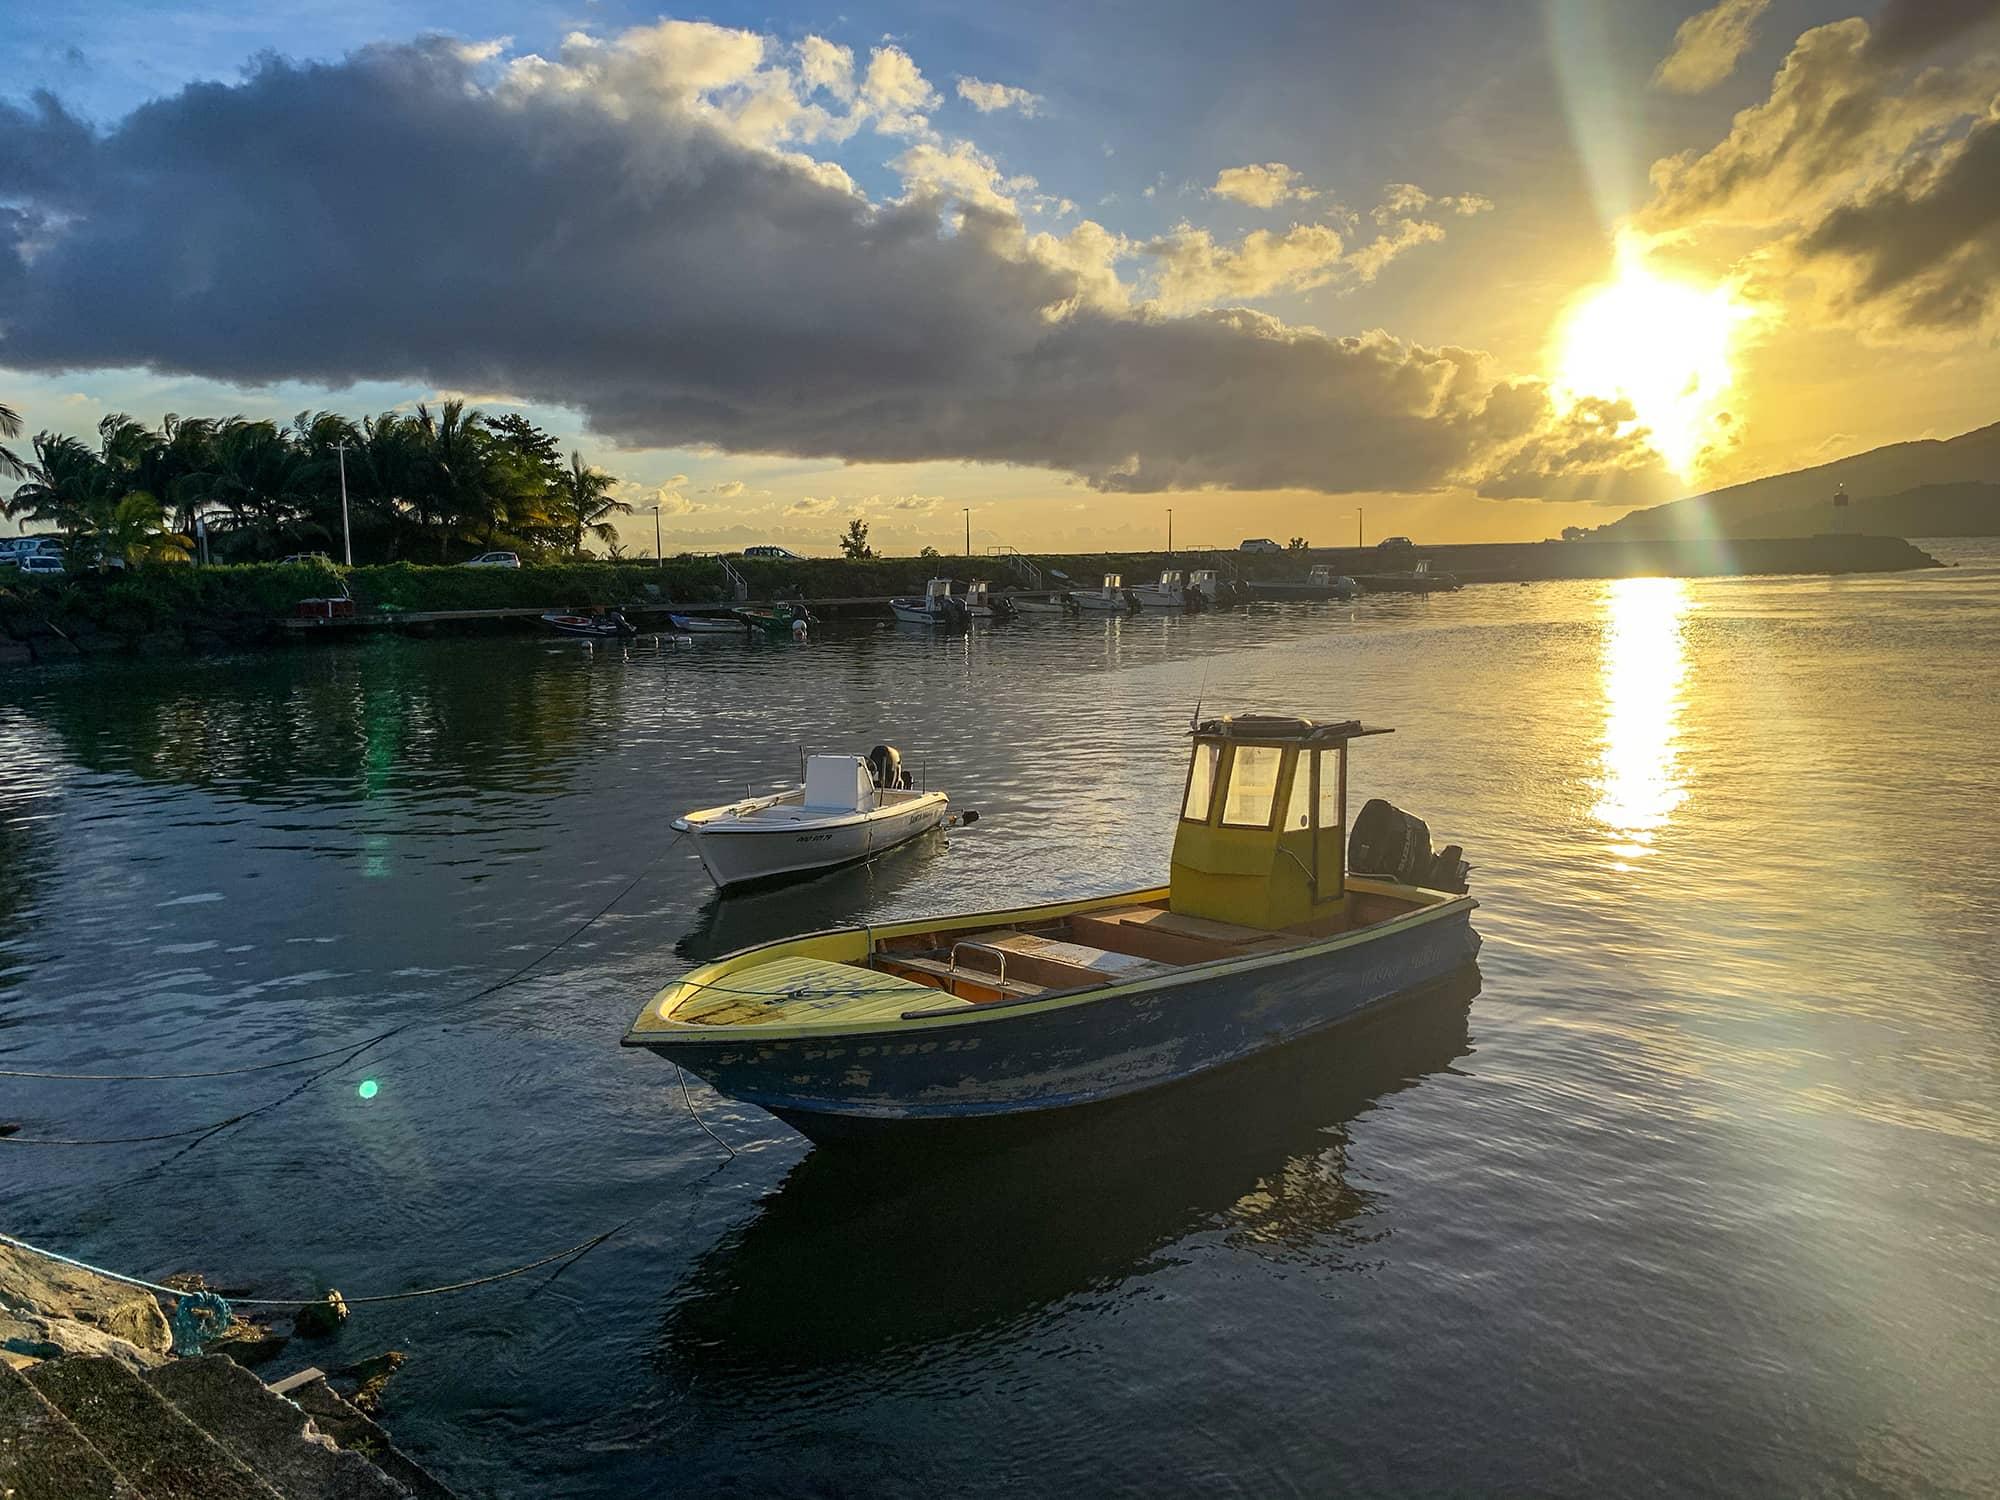 les-saintes-bateau-sunset-guadeloupe-basse-terre